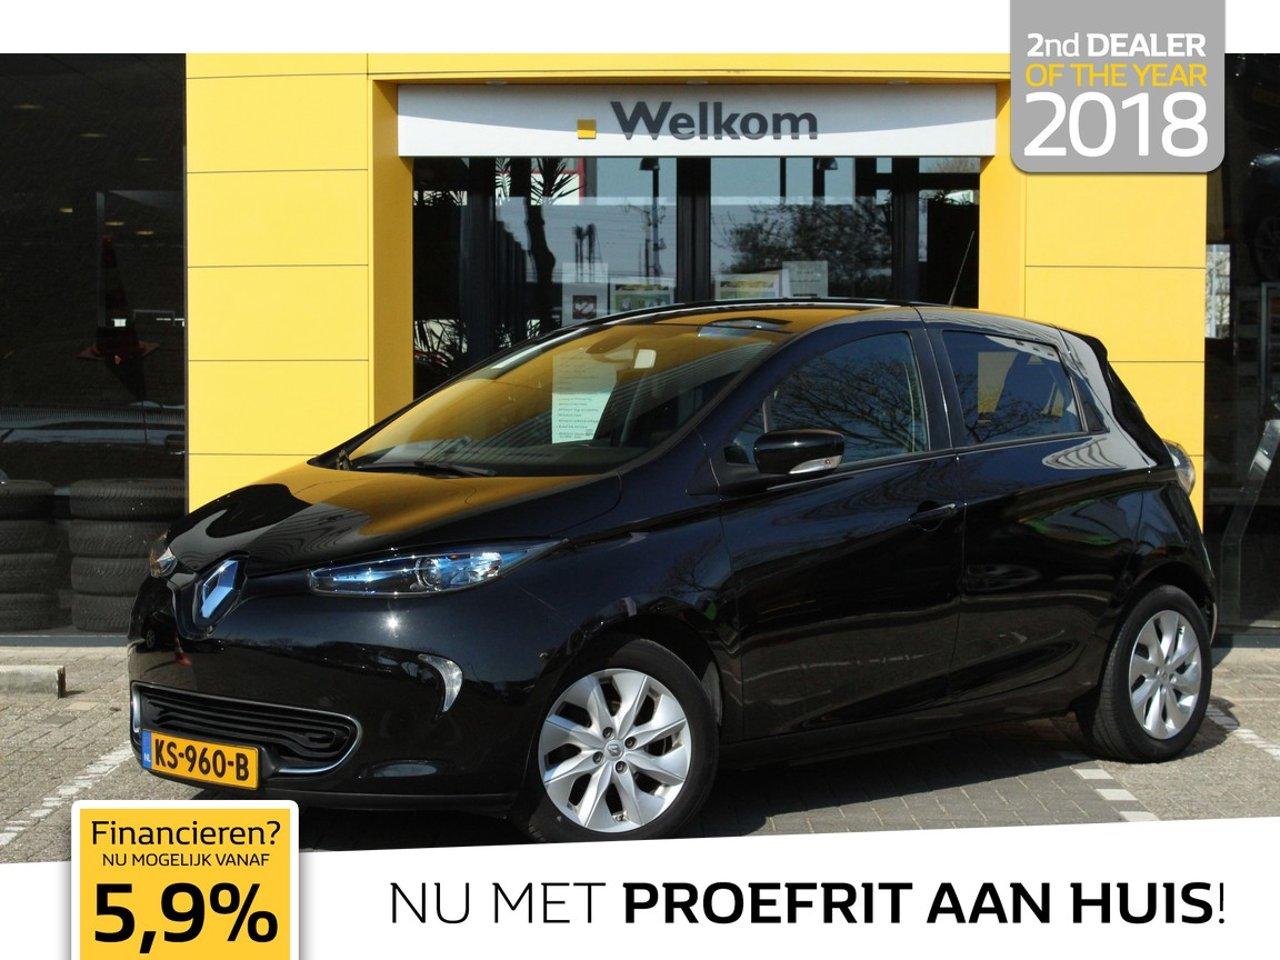 RenaultZoe - Q210 Intens Quickcharge 22 kWh (ex Accu) / 4% / CRUISE / CLIMATE / 1E EIGENAAR / 64